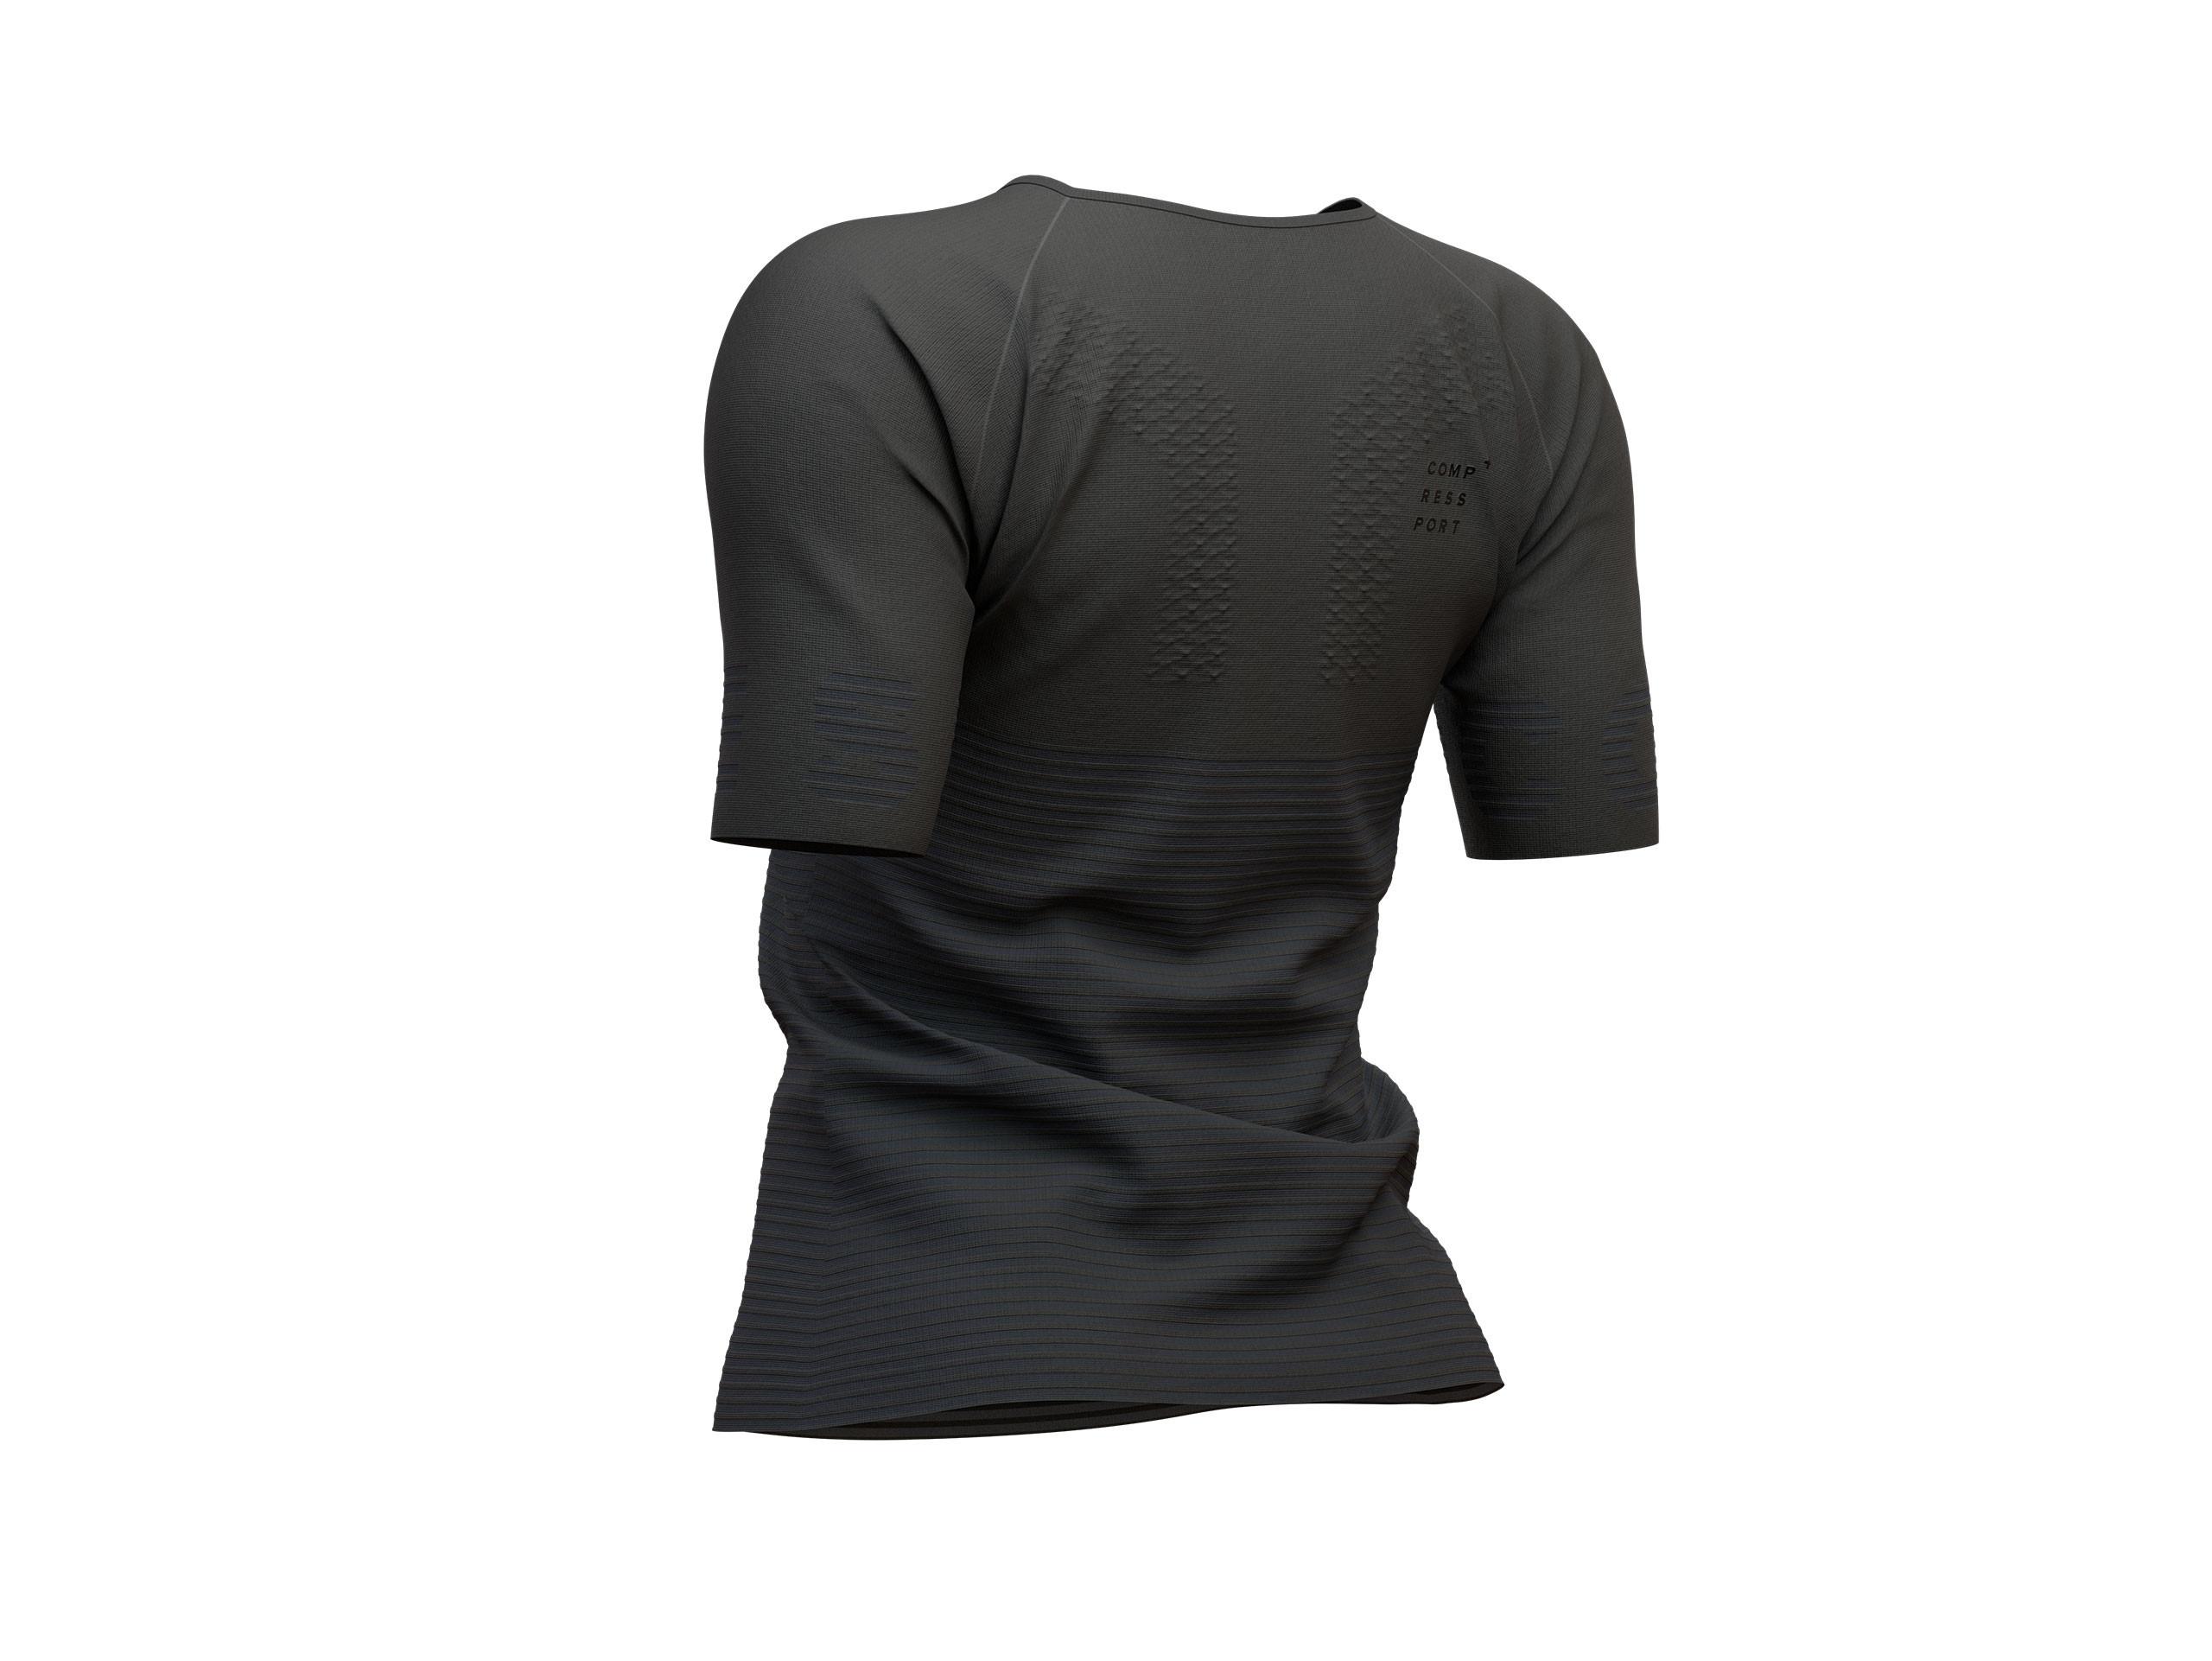 Kurzärmeliges Damen-Trainigsshirt - Black Edition 2019